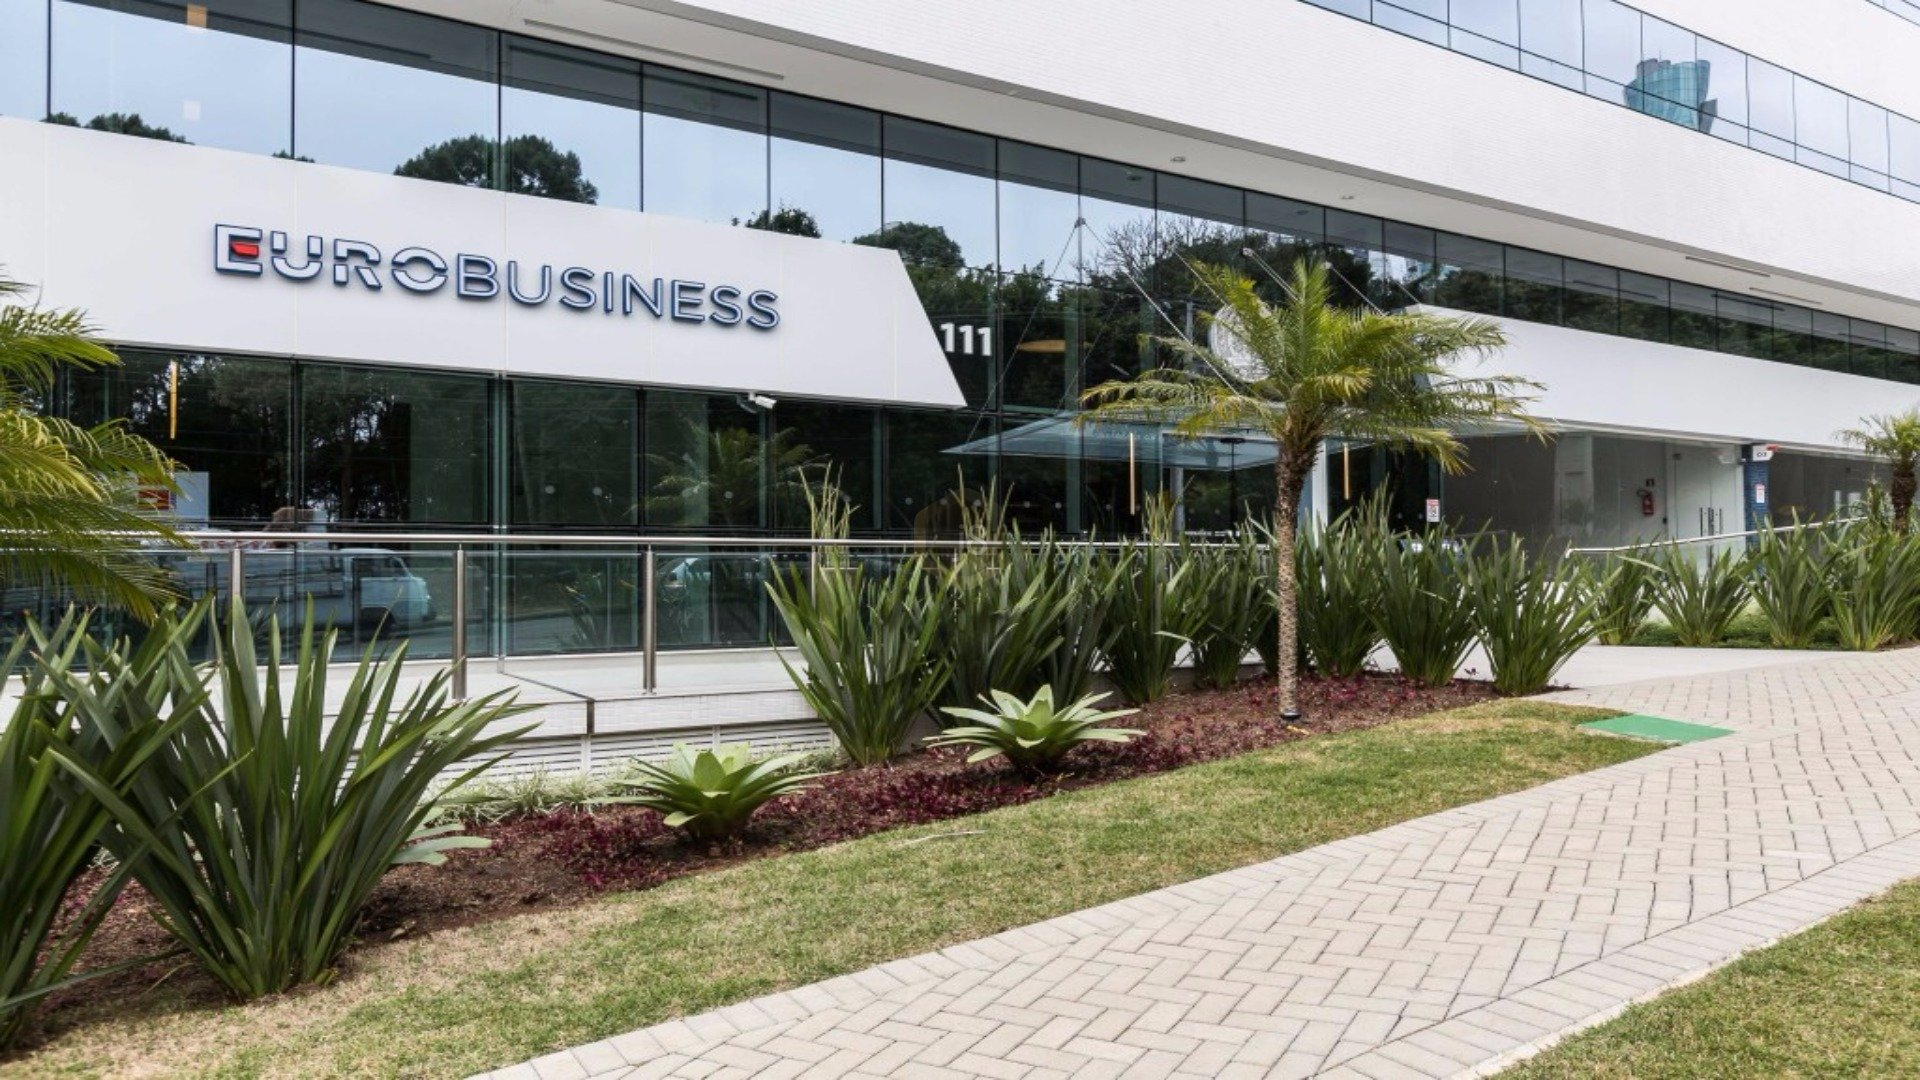 The LEED Platinum, LEED Zero Water Eurobusiness building